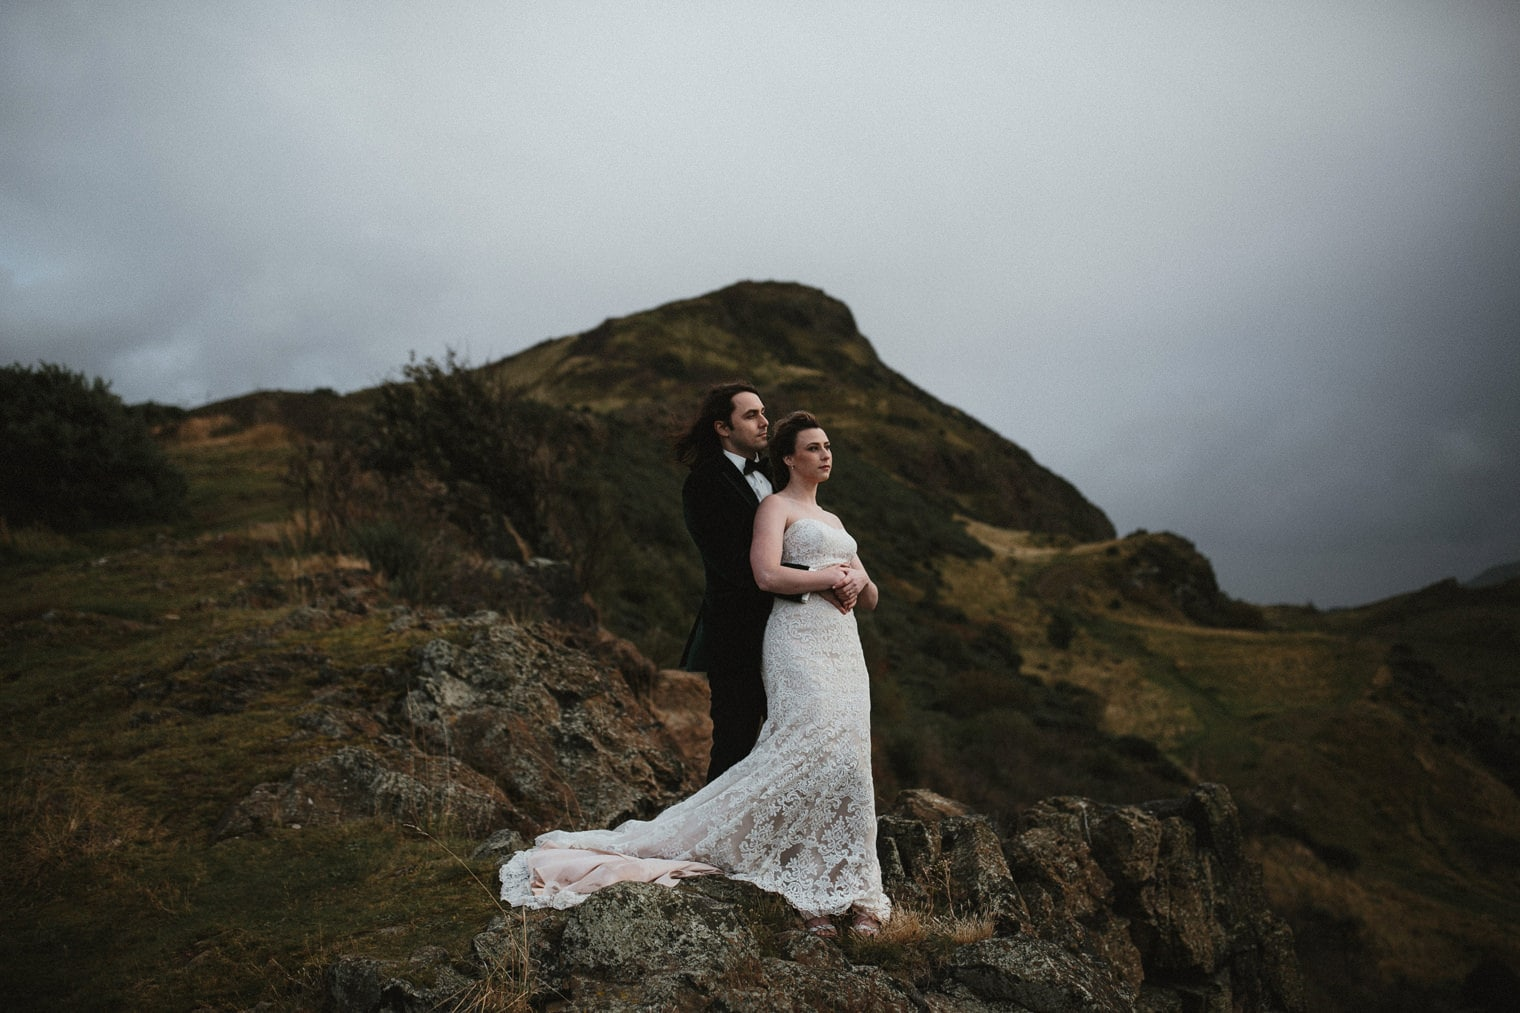 Bride and Groom in Holyrood Park during their Edinburgh Wedding